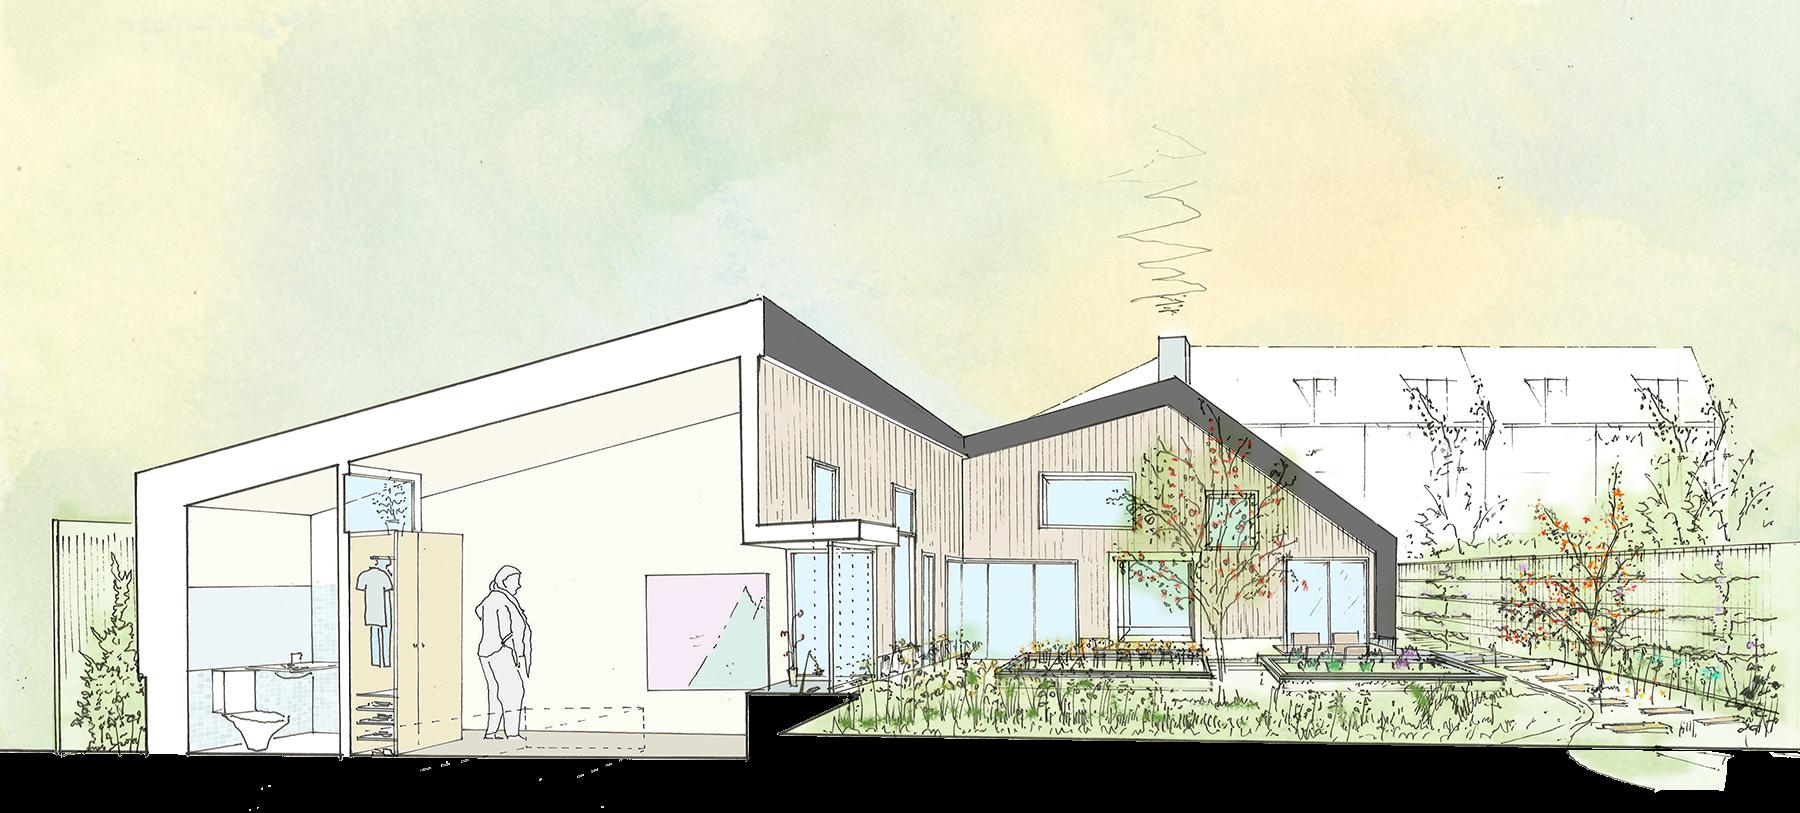 Sarah-Wigglesworth-Architects Haycroft-Gardens Development-Section-Bedroom 1800